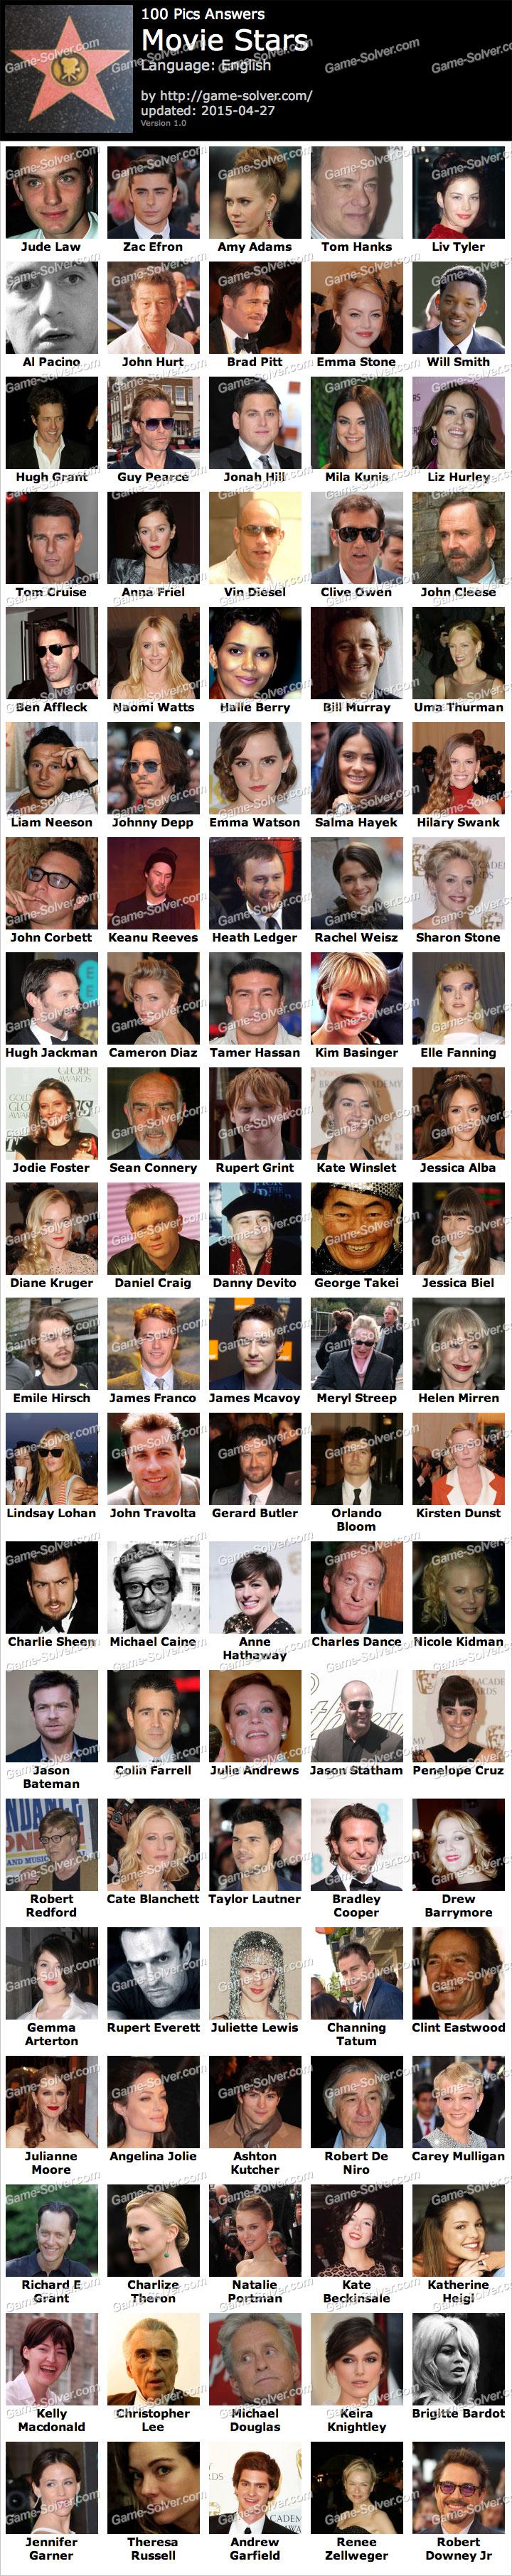 Quiz pics 100 movie stars